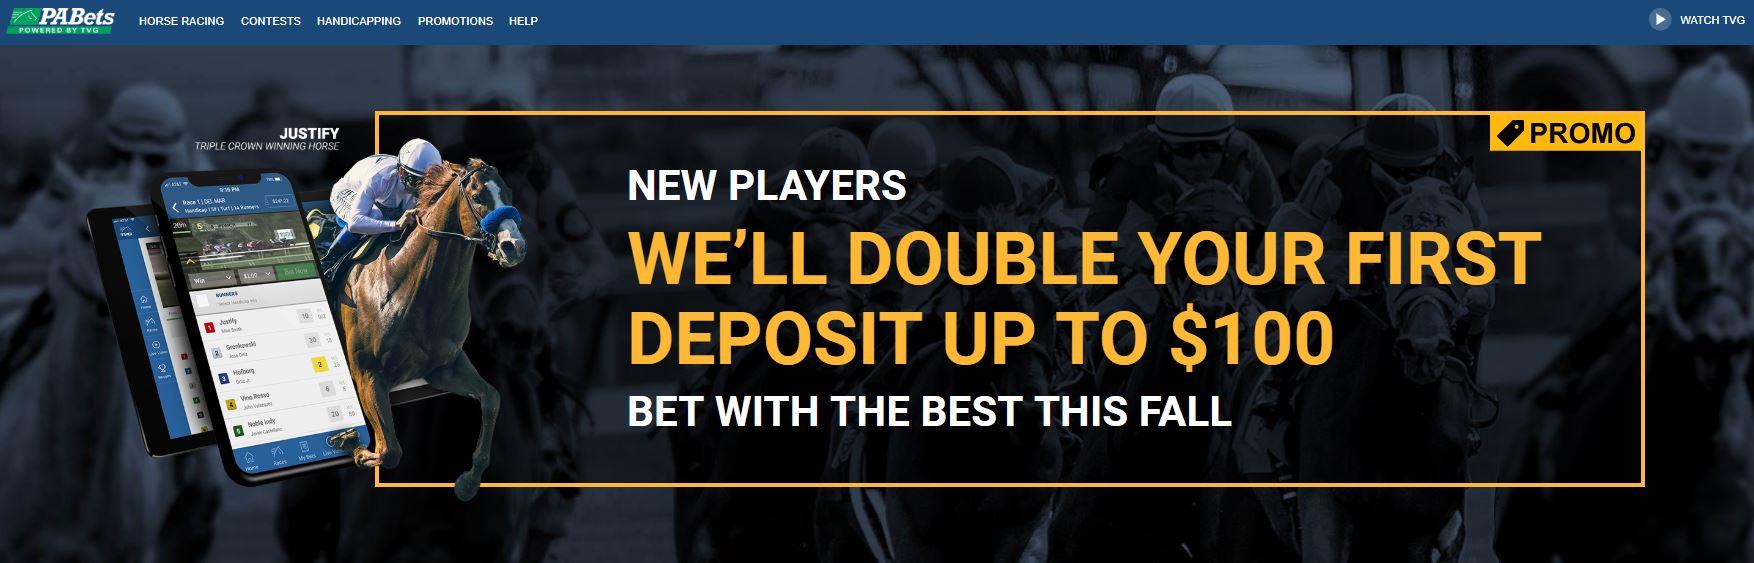 Bet 52 Promo Code 2019 - Bonus 100 up to 100 - Sports - Casino